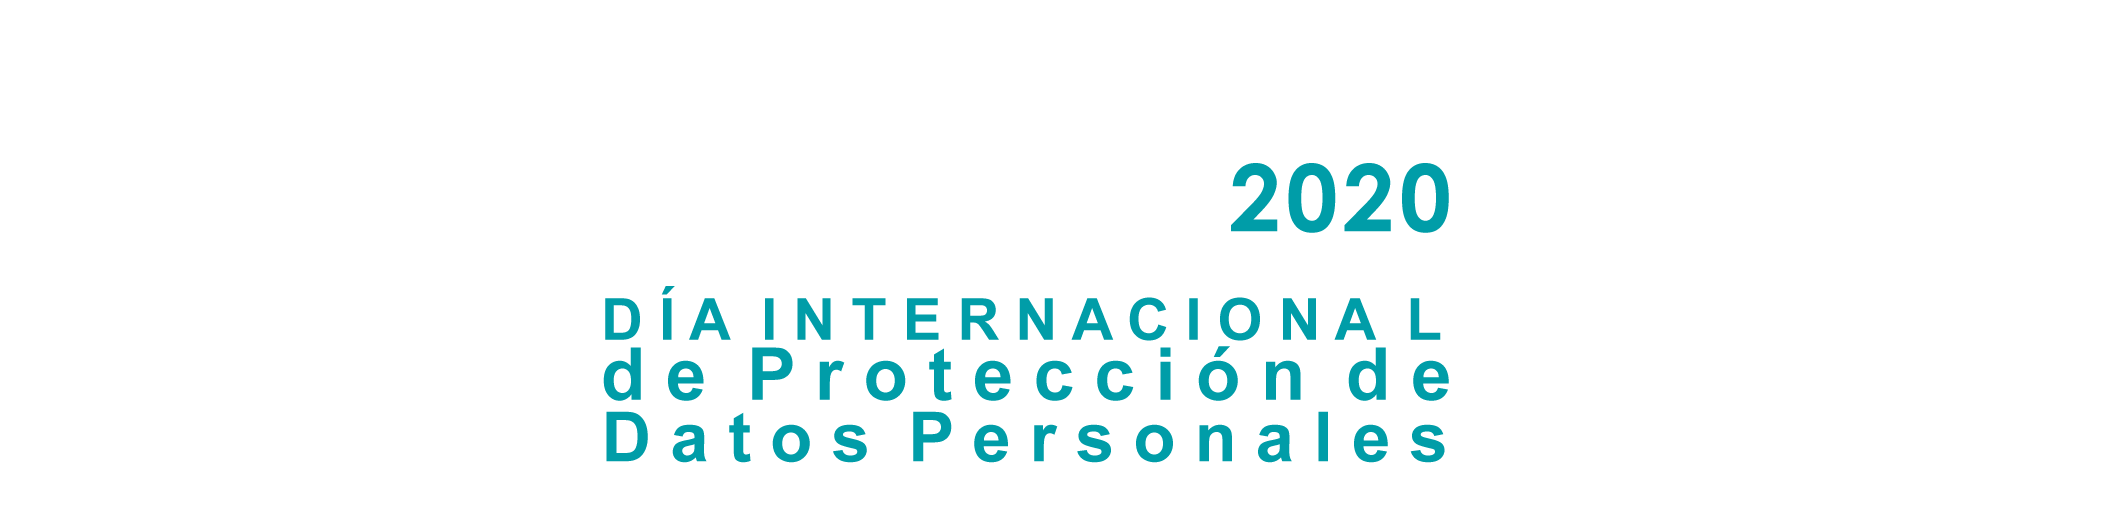 jornadassocializacionpdp2020_texto.png